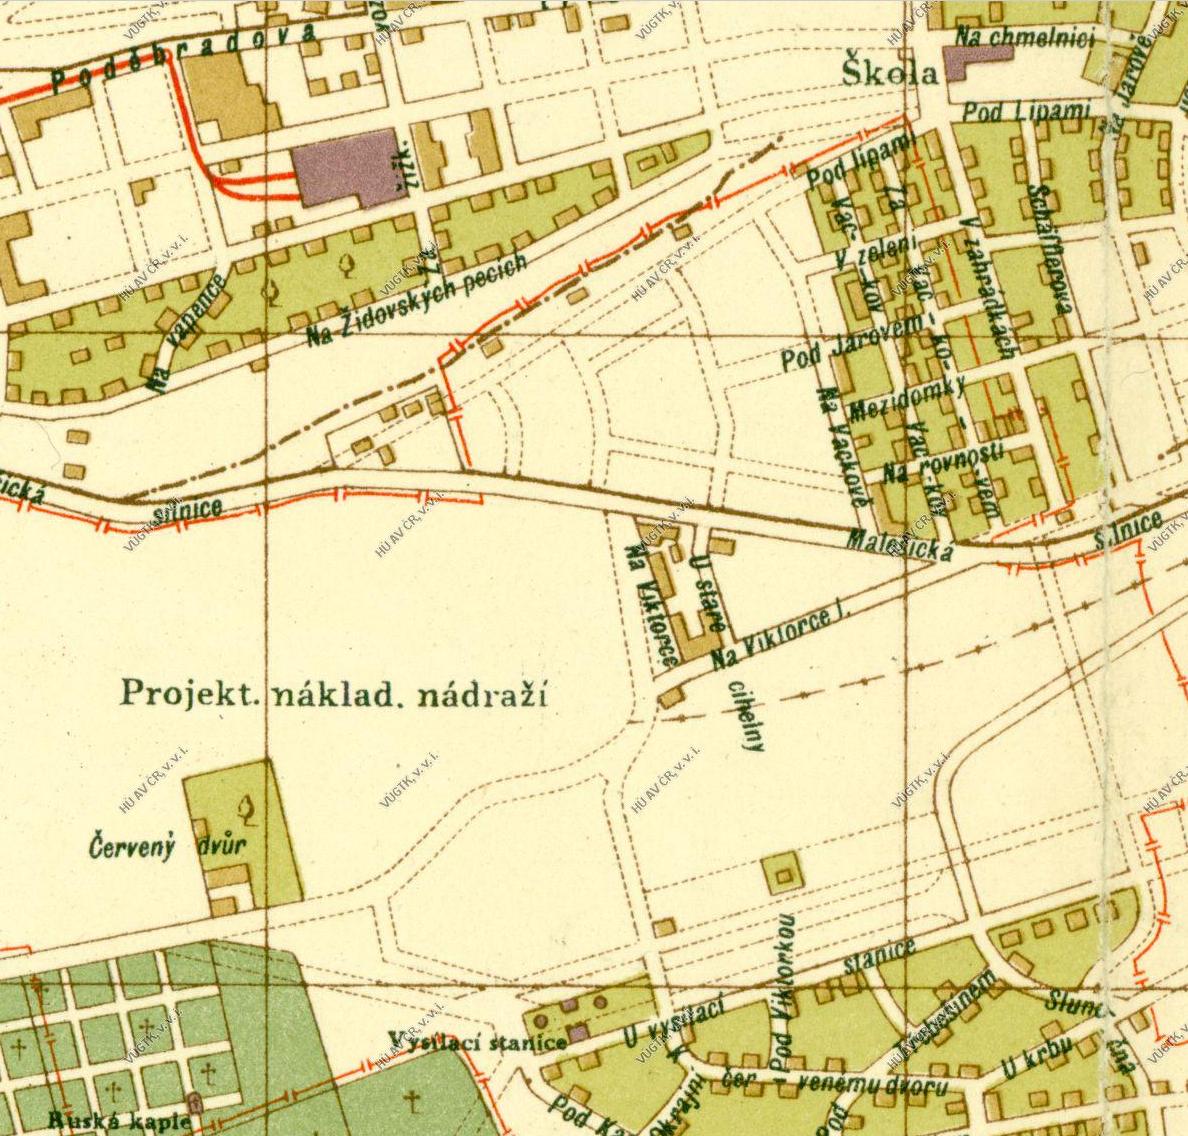 nouzova-kolonie-viktorka-mapa-1929